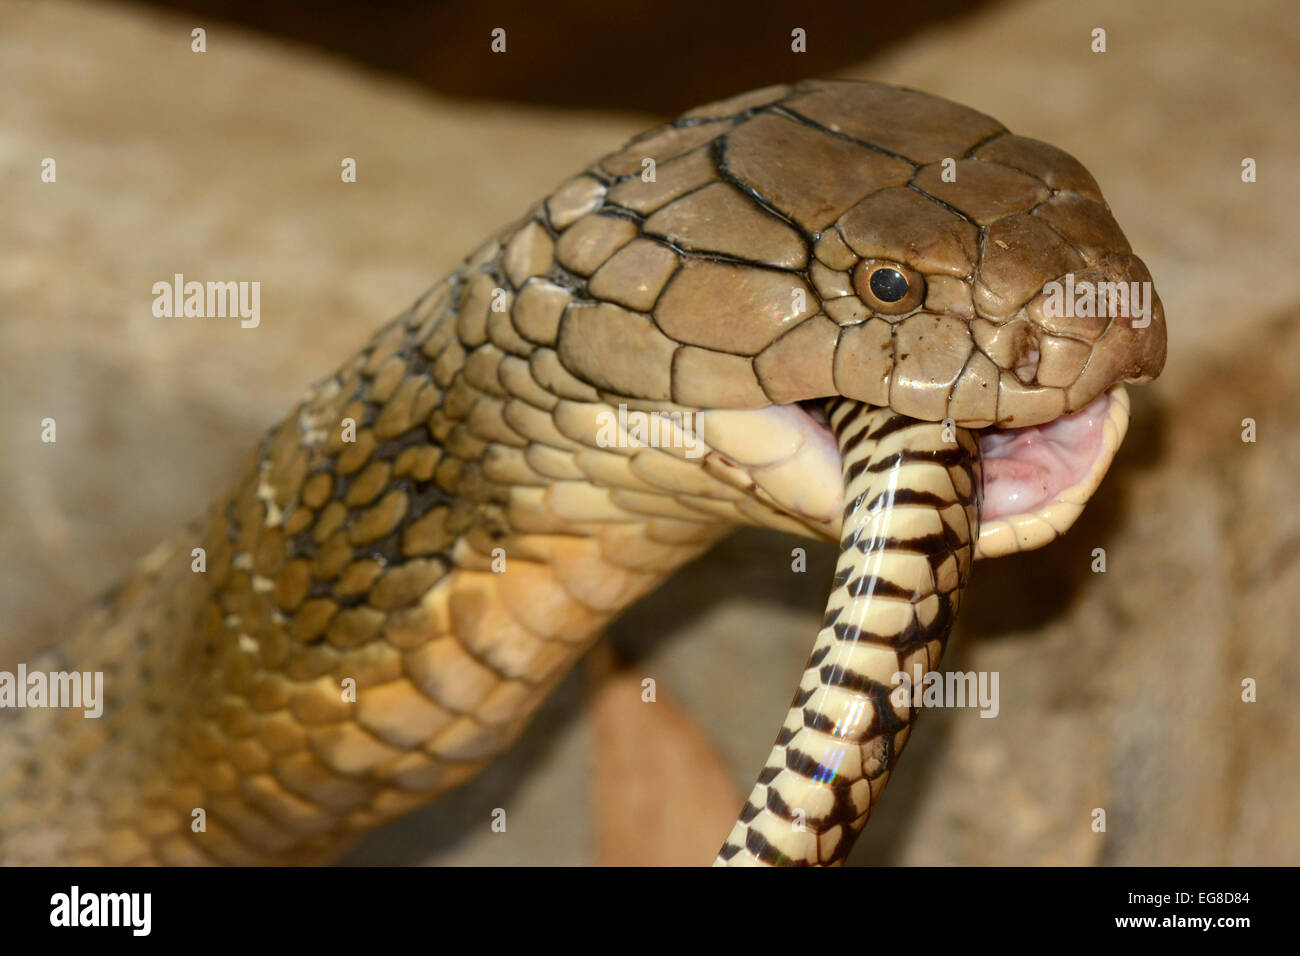 King Cobra (Ophiophagus hannah) swallowing a rat snake